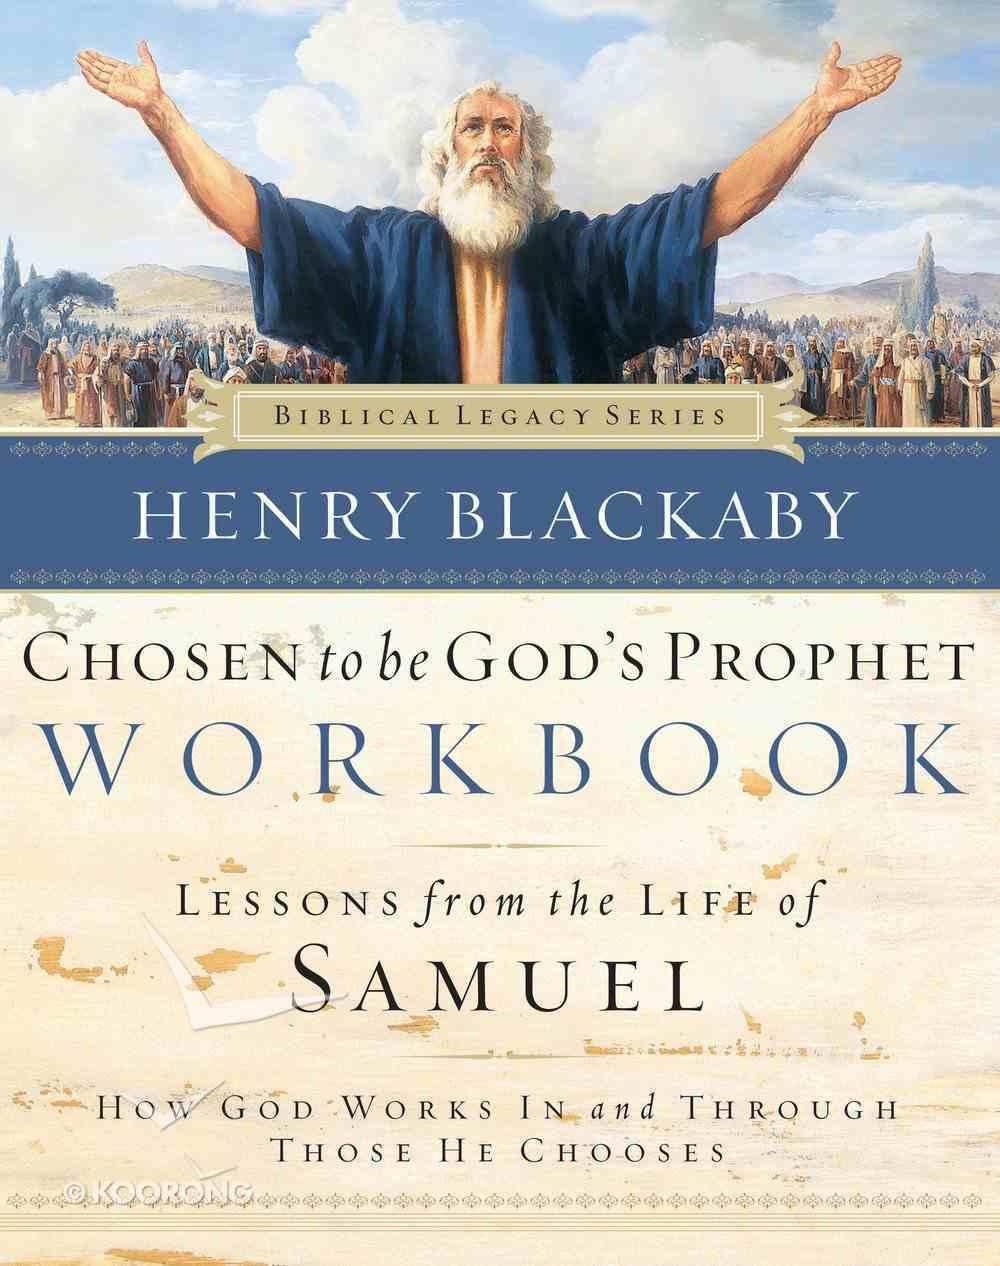 Chosen to Be God's Prophet (Workbook) (Biblical Legacy Series) eBook